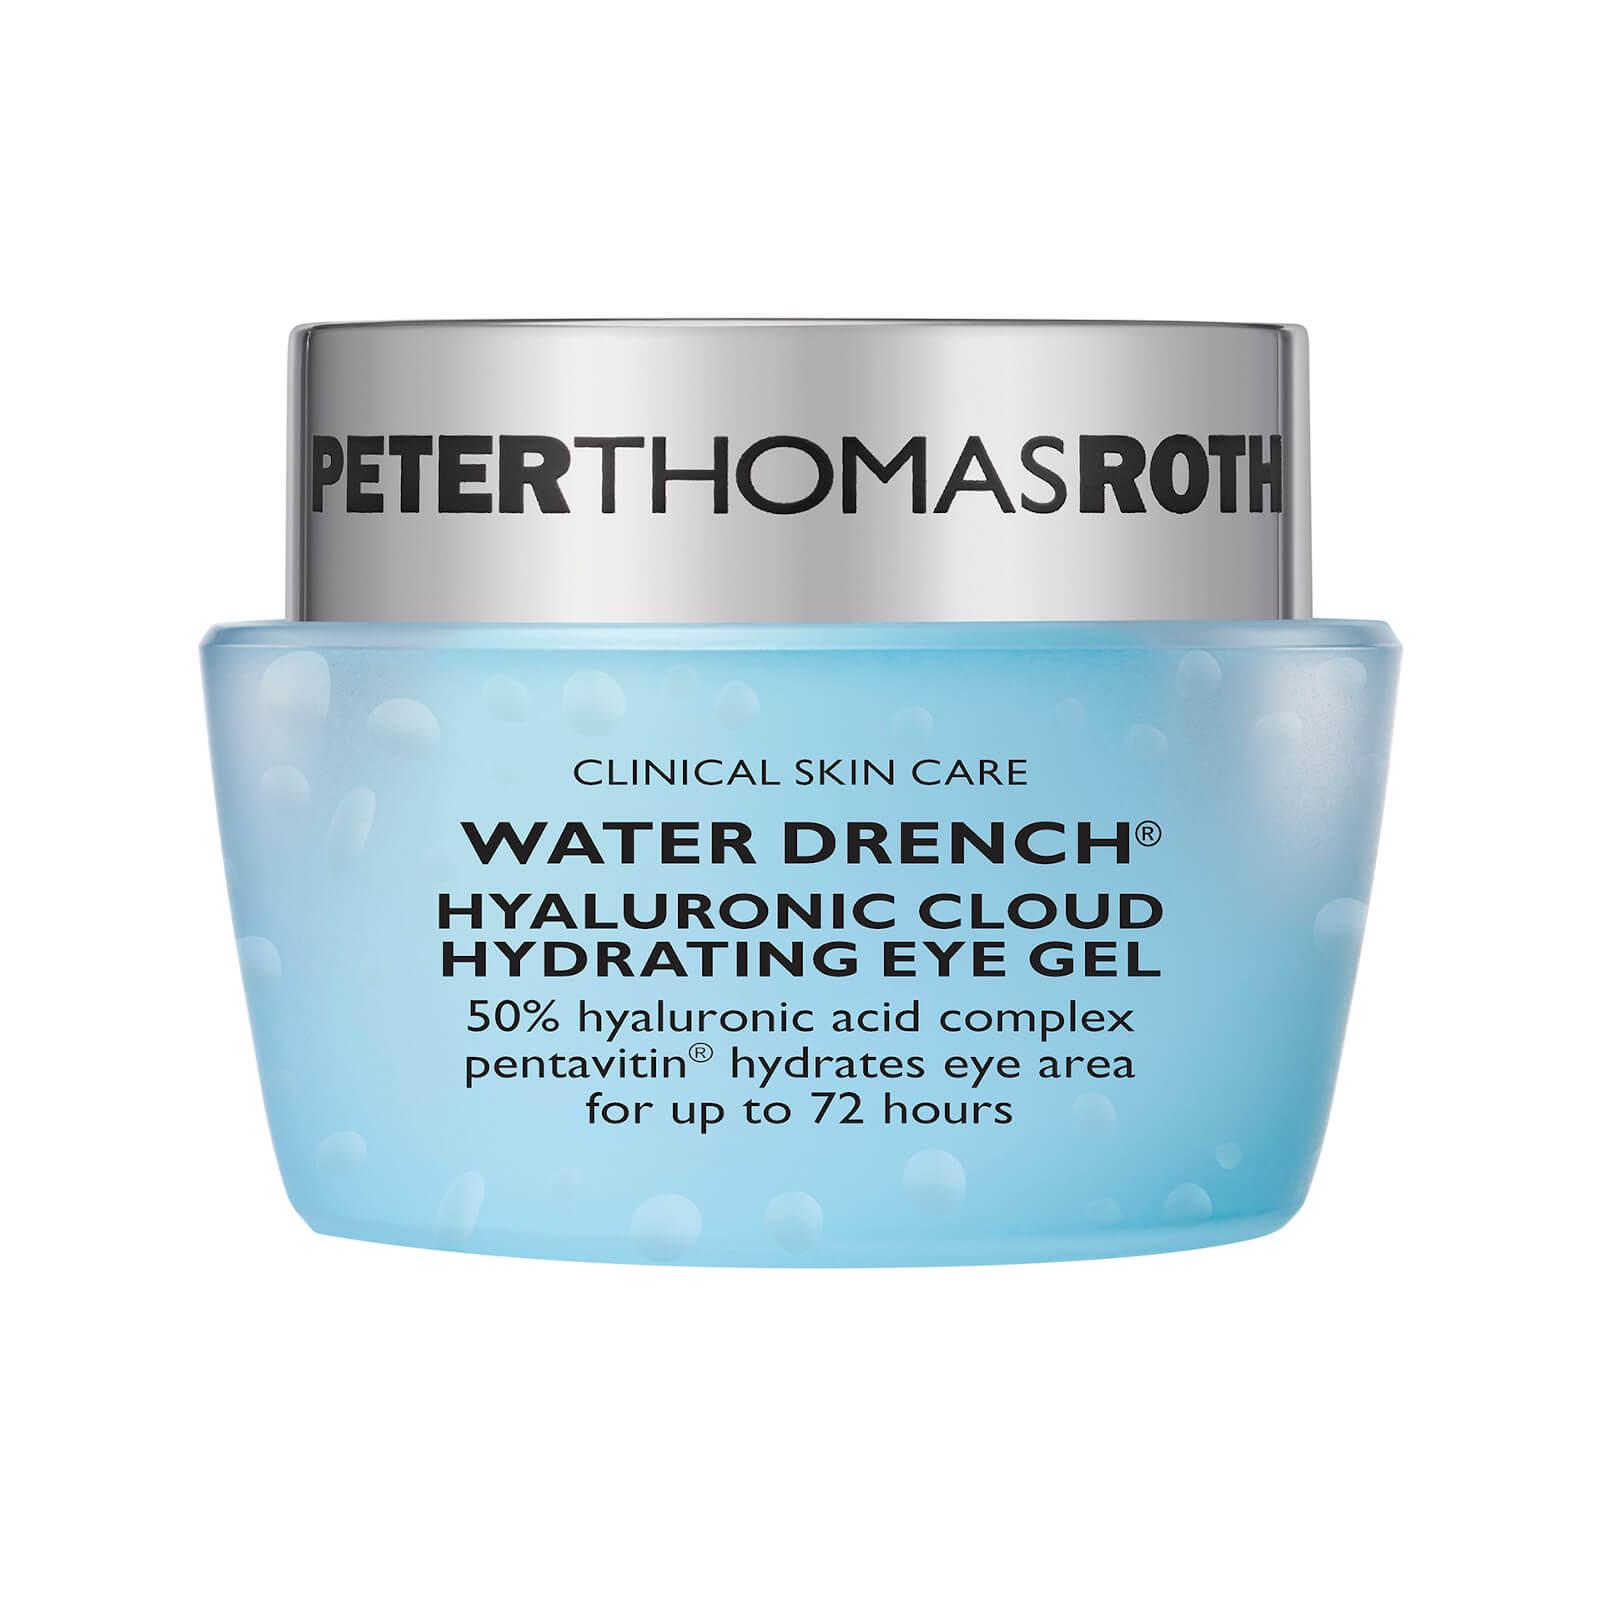 Купить Peter Thomas Roth Water Drench Hyaluronic Cloud Hydrating Eye Gel